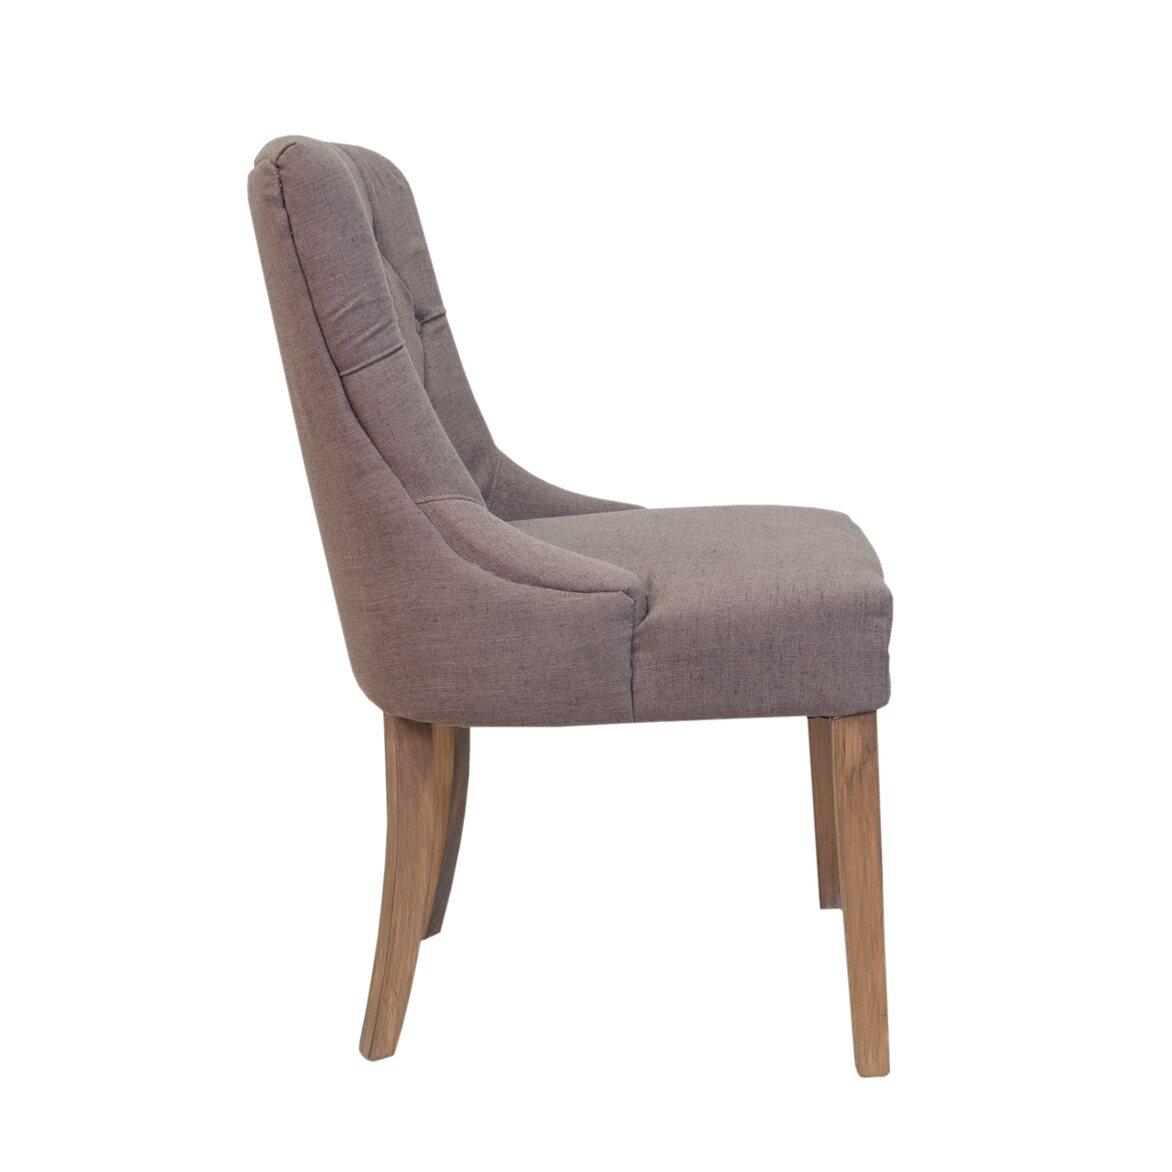 Стул Avec 2 | Обеденные стулья Kingsby